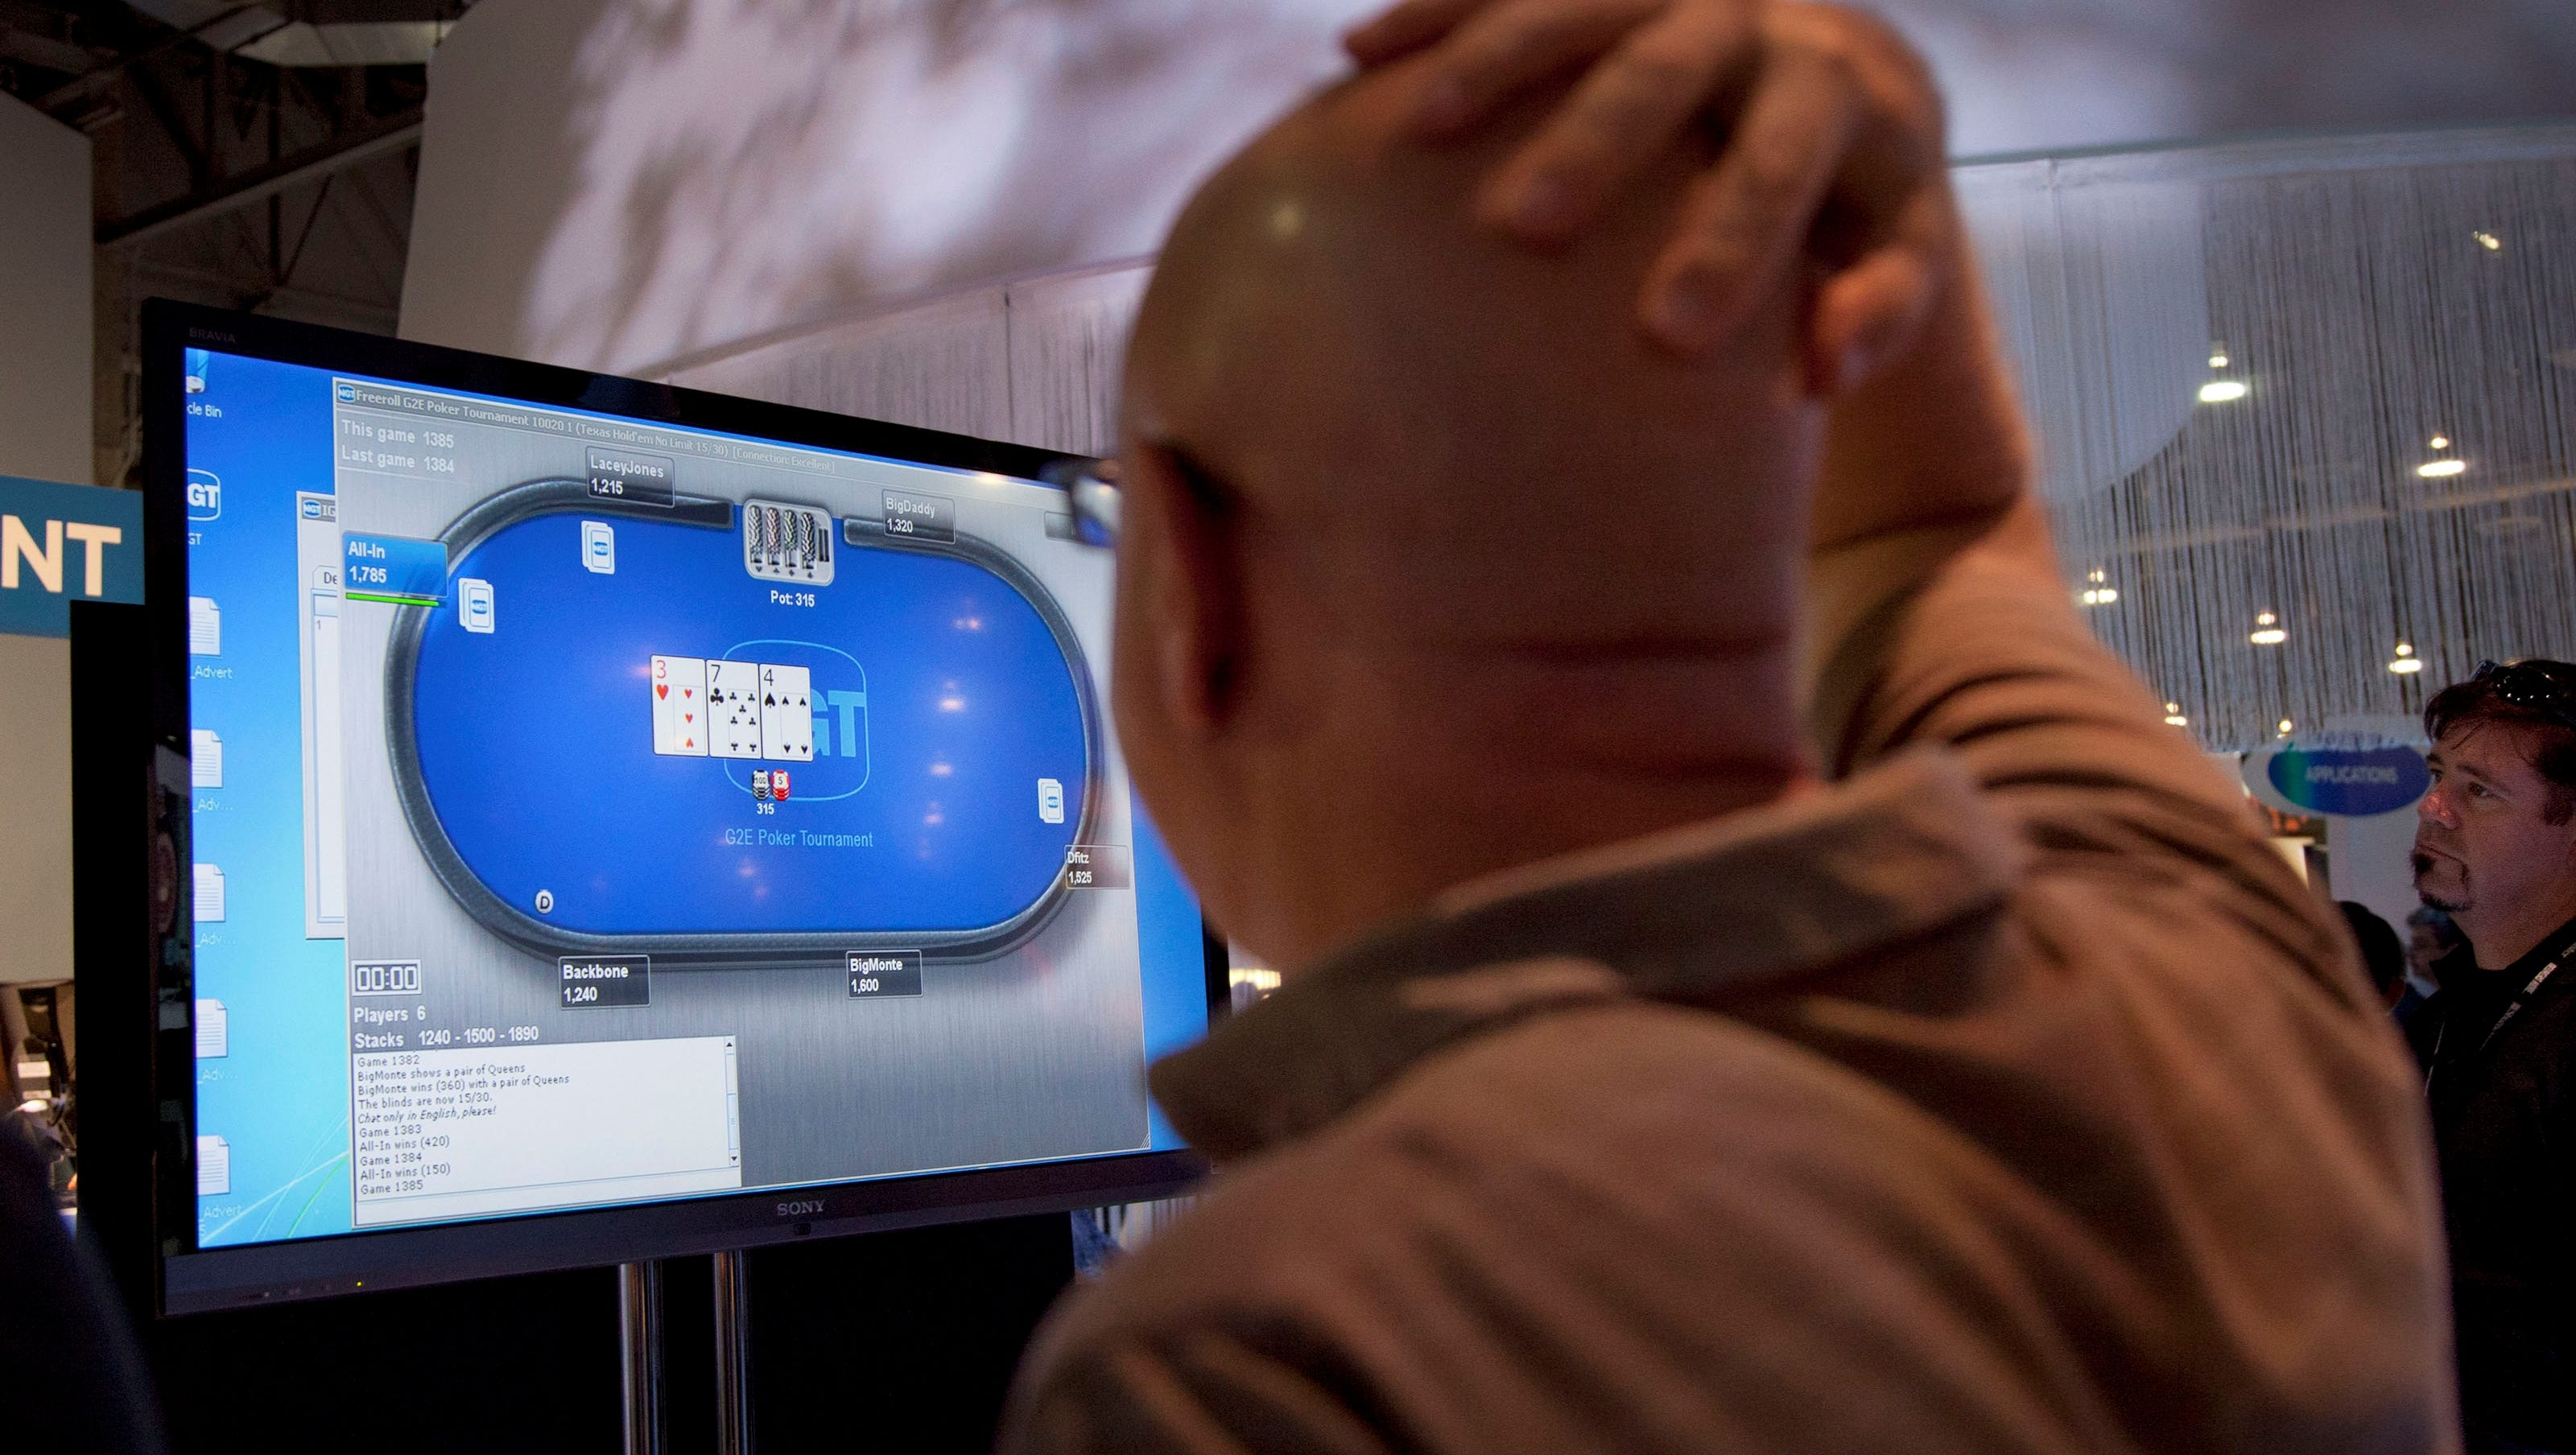 real time internet merchant gambling account